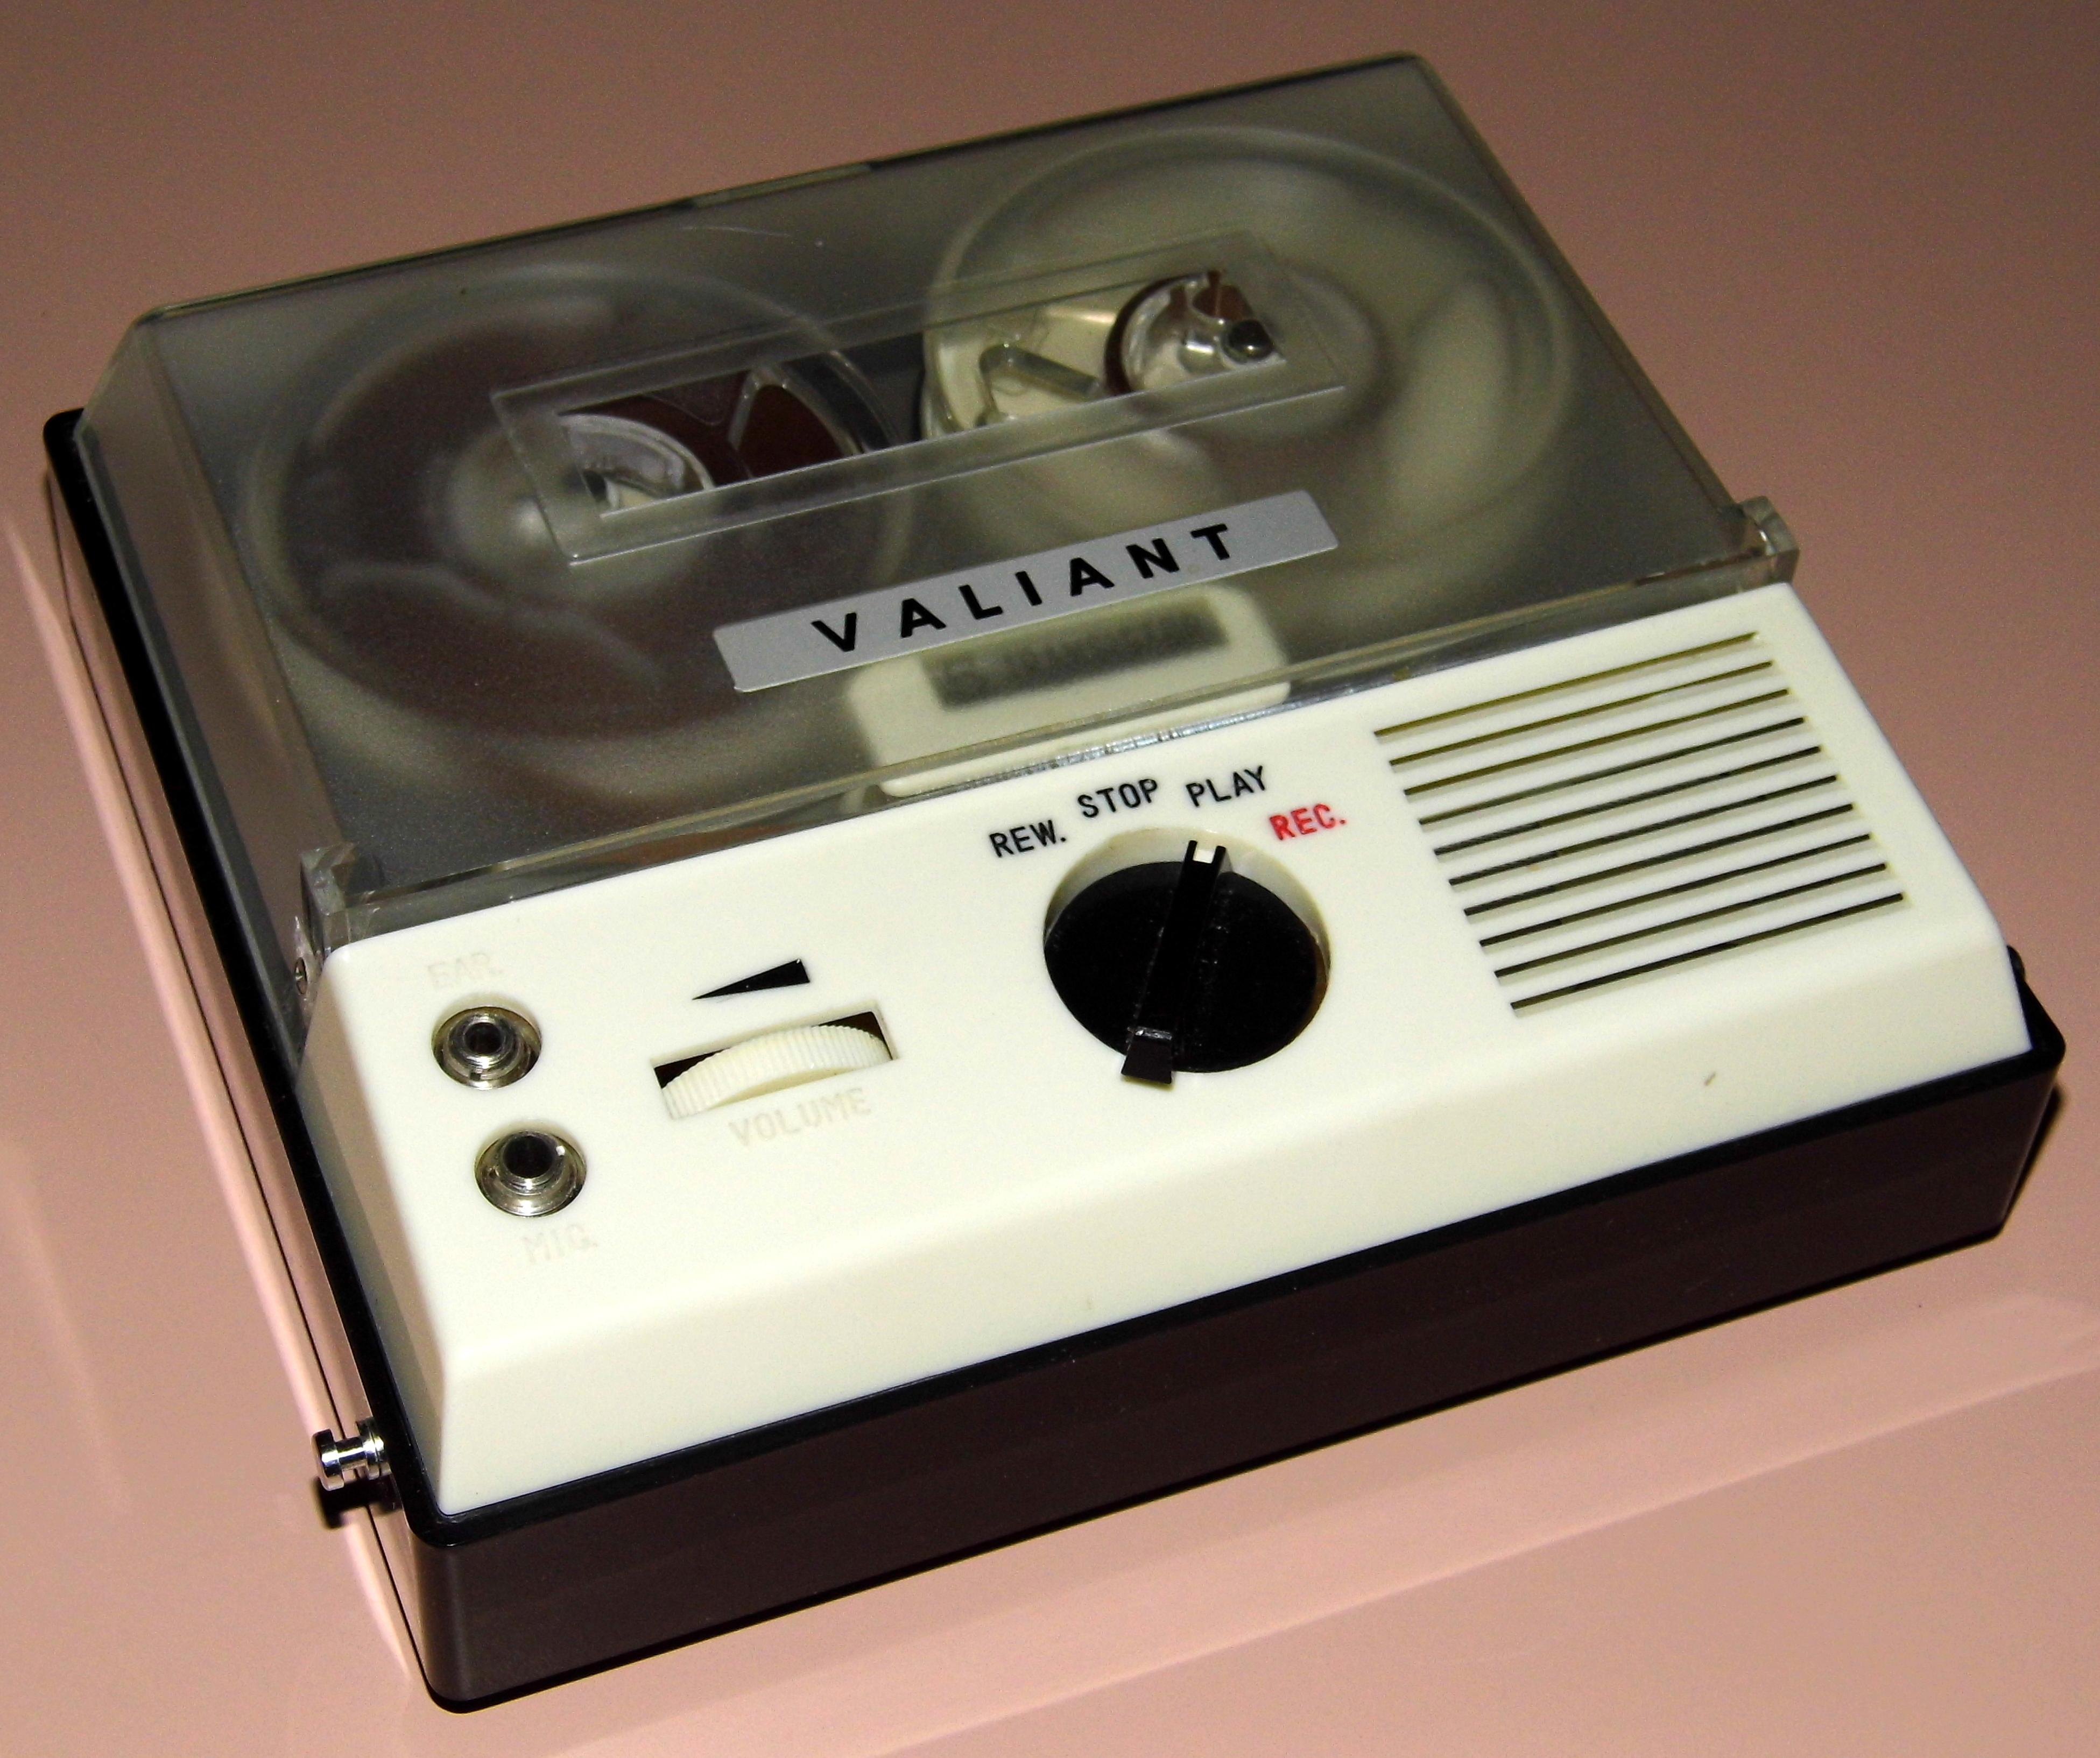 Audio Recorder For Dog Barking